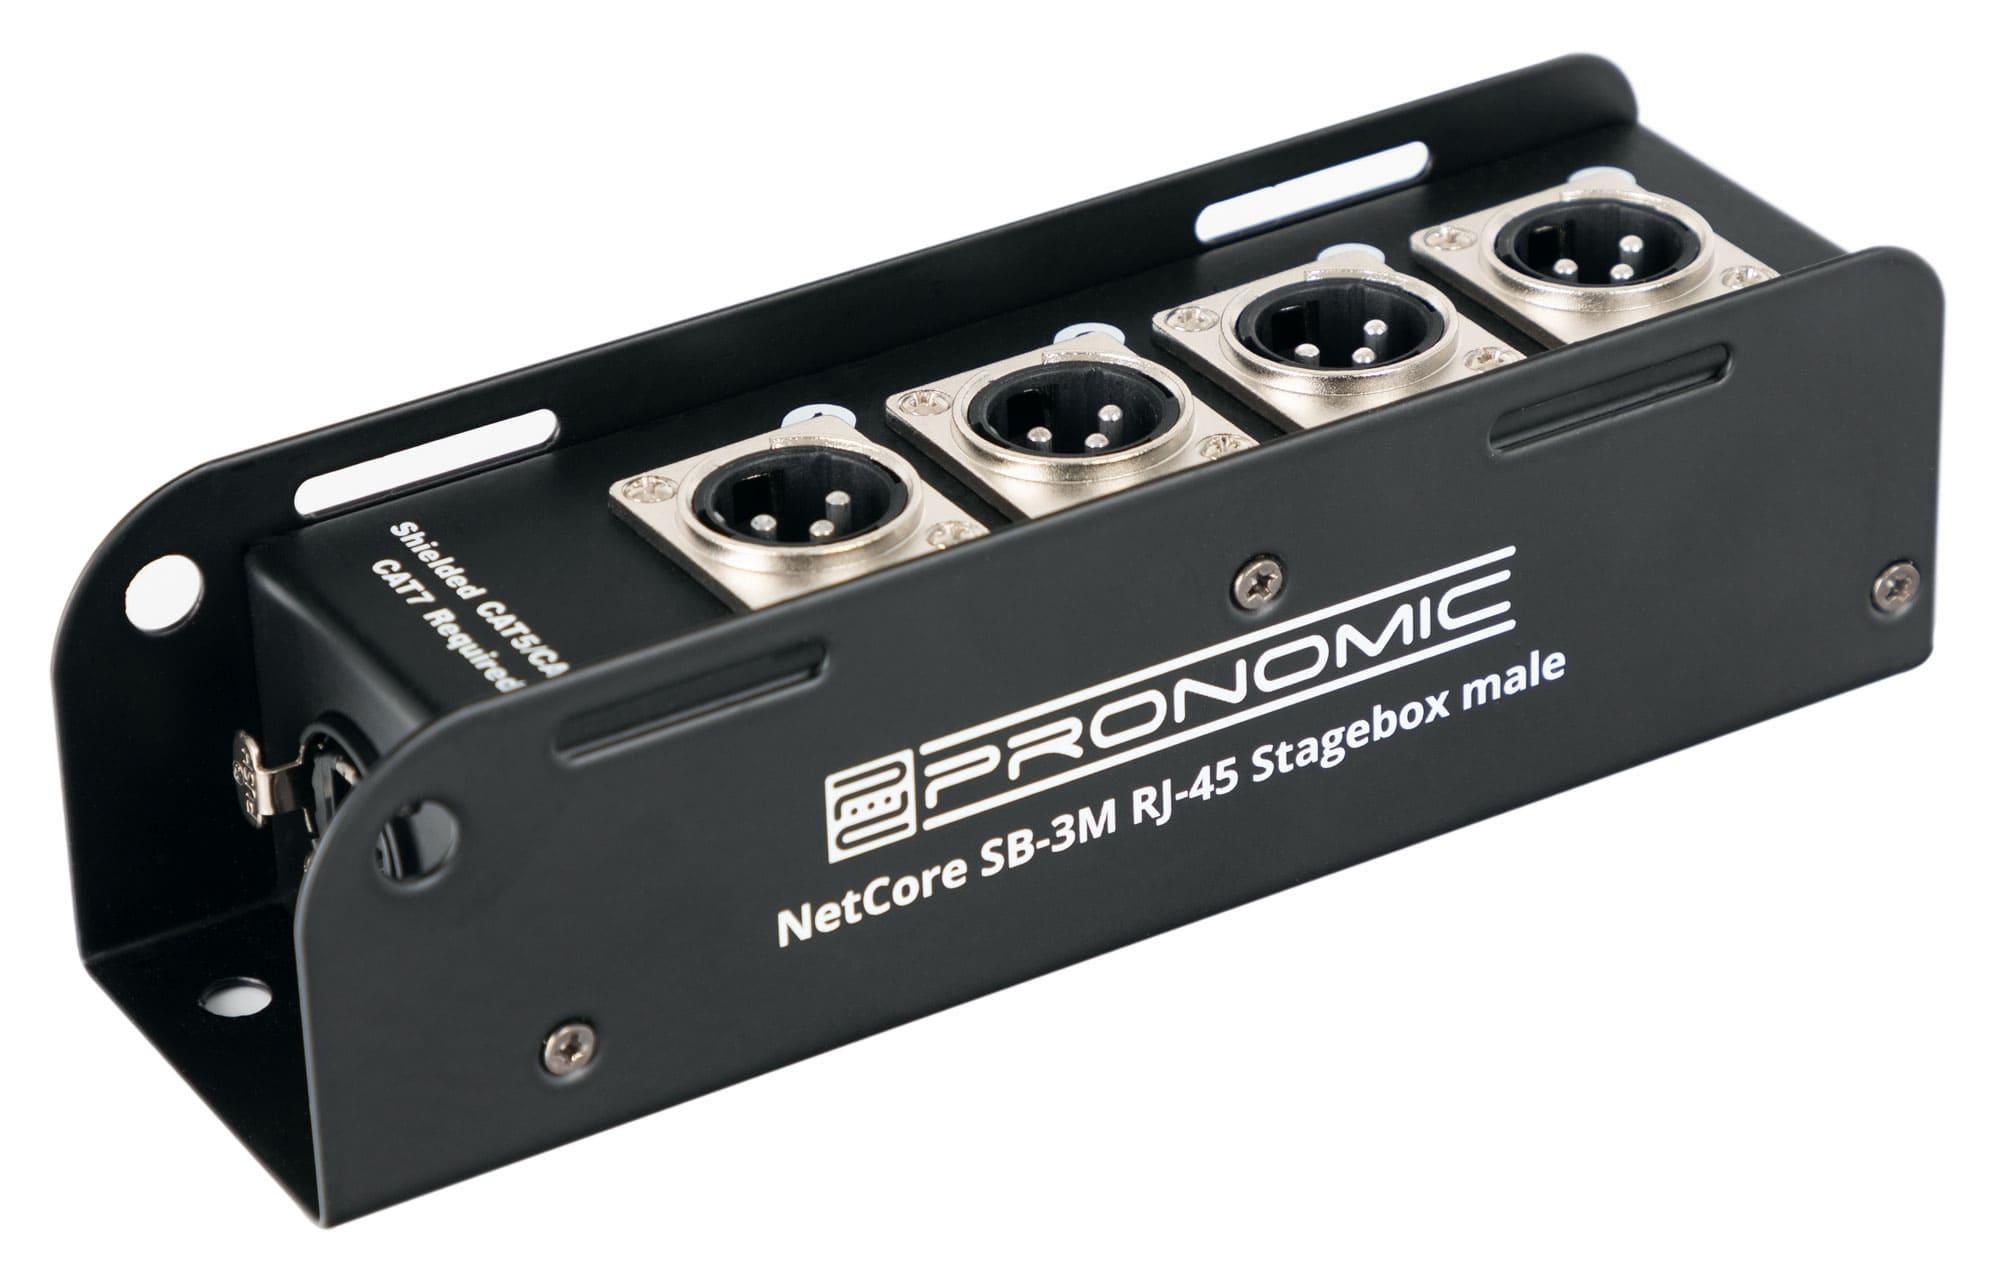 Diboxen - Pronomic NetCore SB 3M Multicore Stagebox male - Onlineshop Musikhaus Kirstein